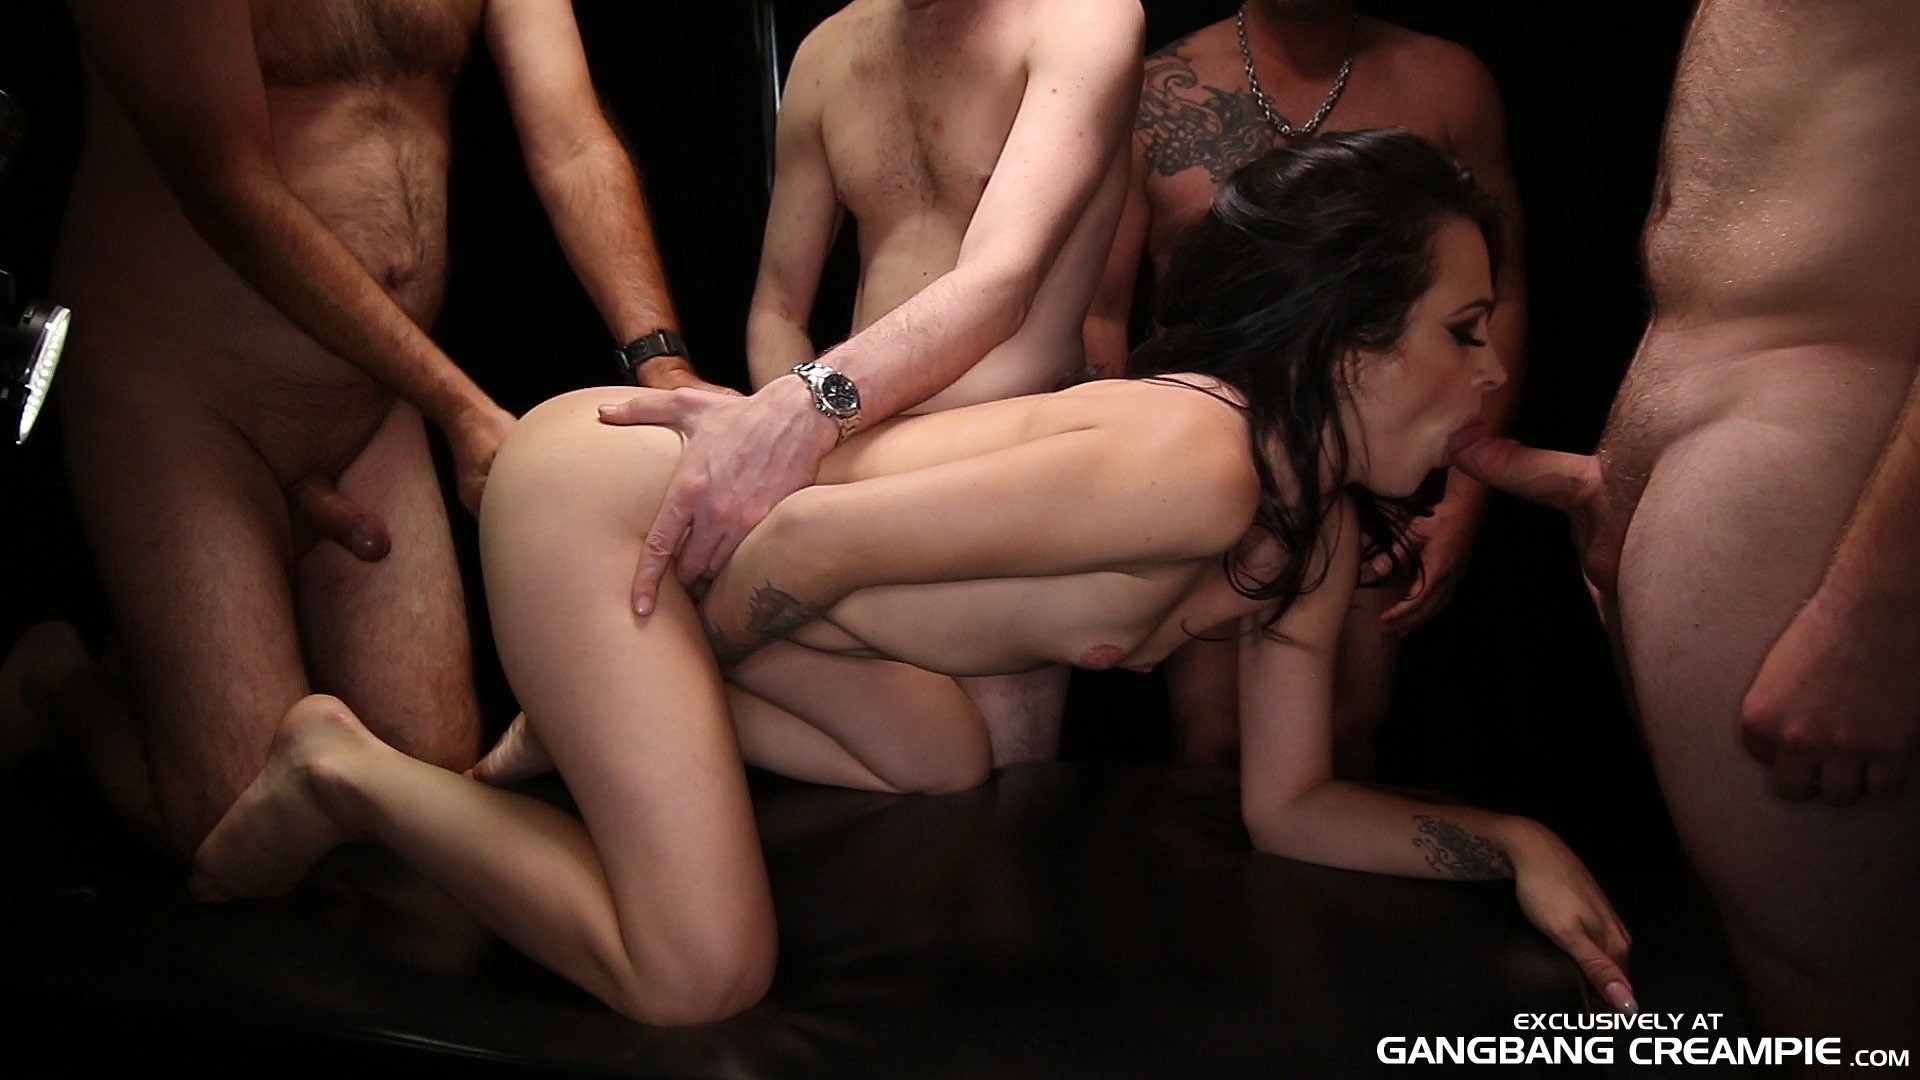 Creampie gangbang black porn